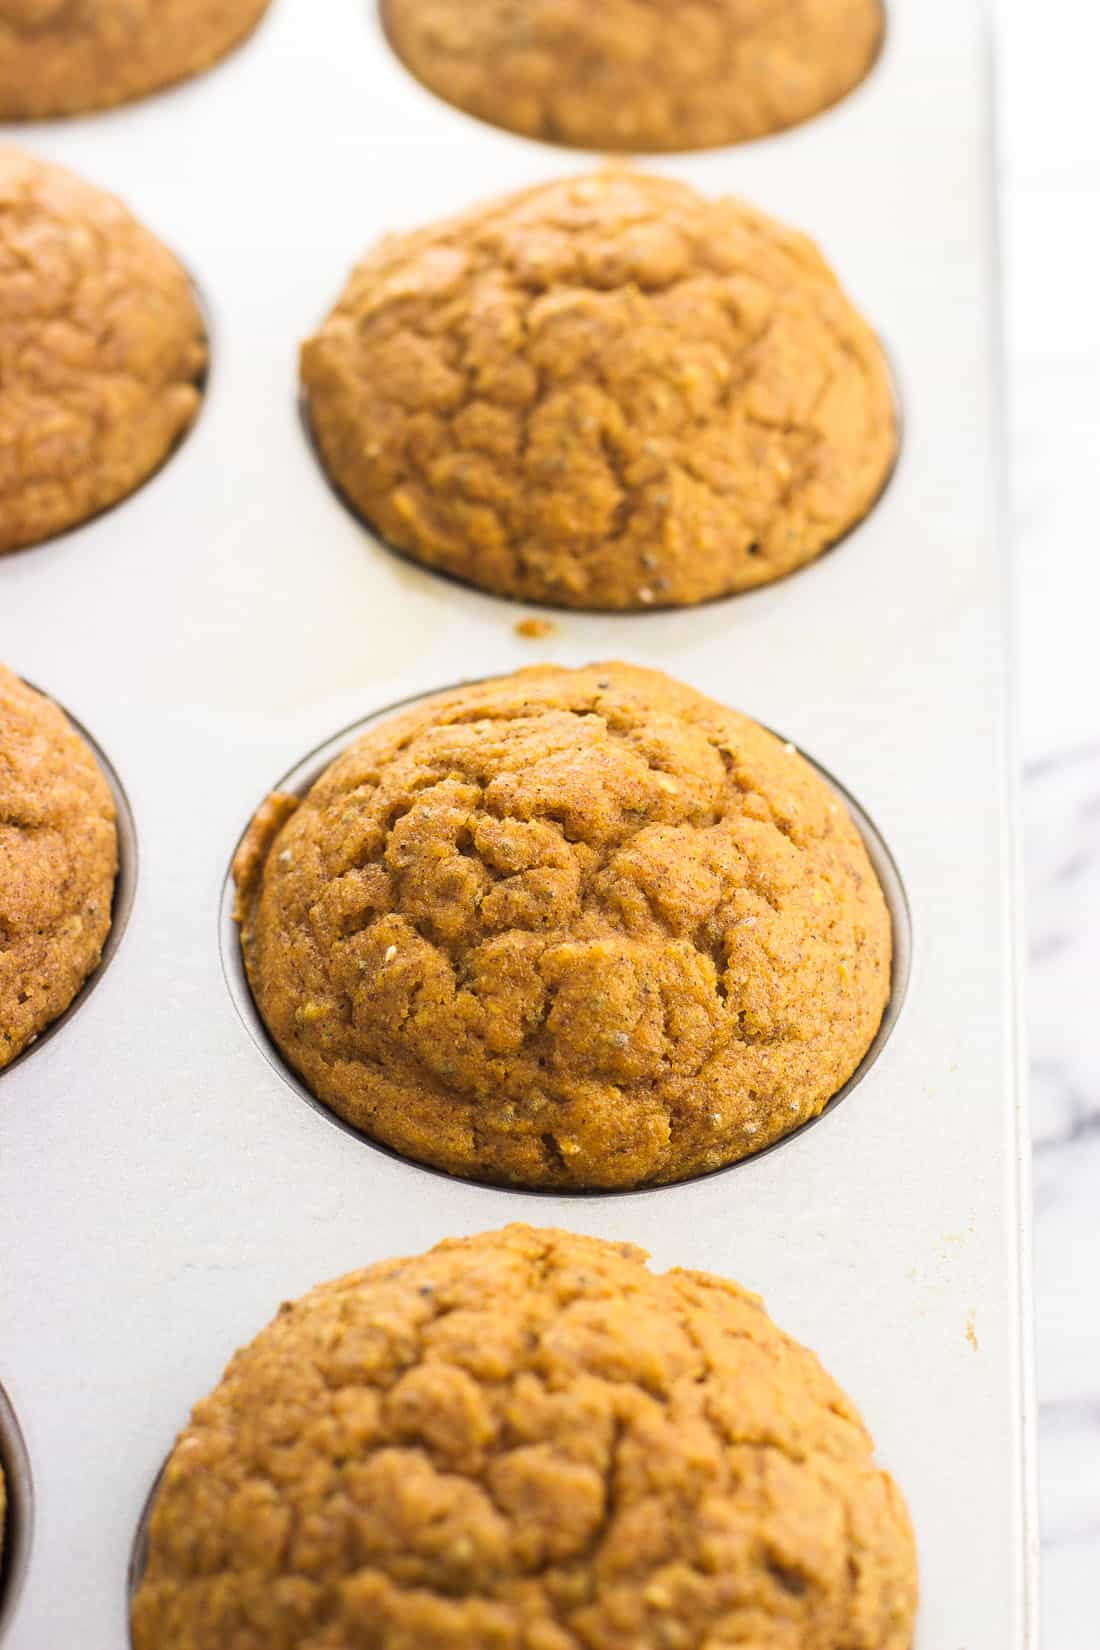 Baked pumpkin muffins in a metal muffin tin